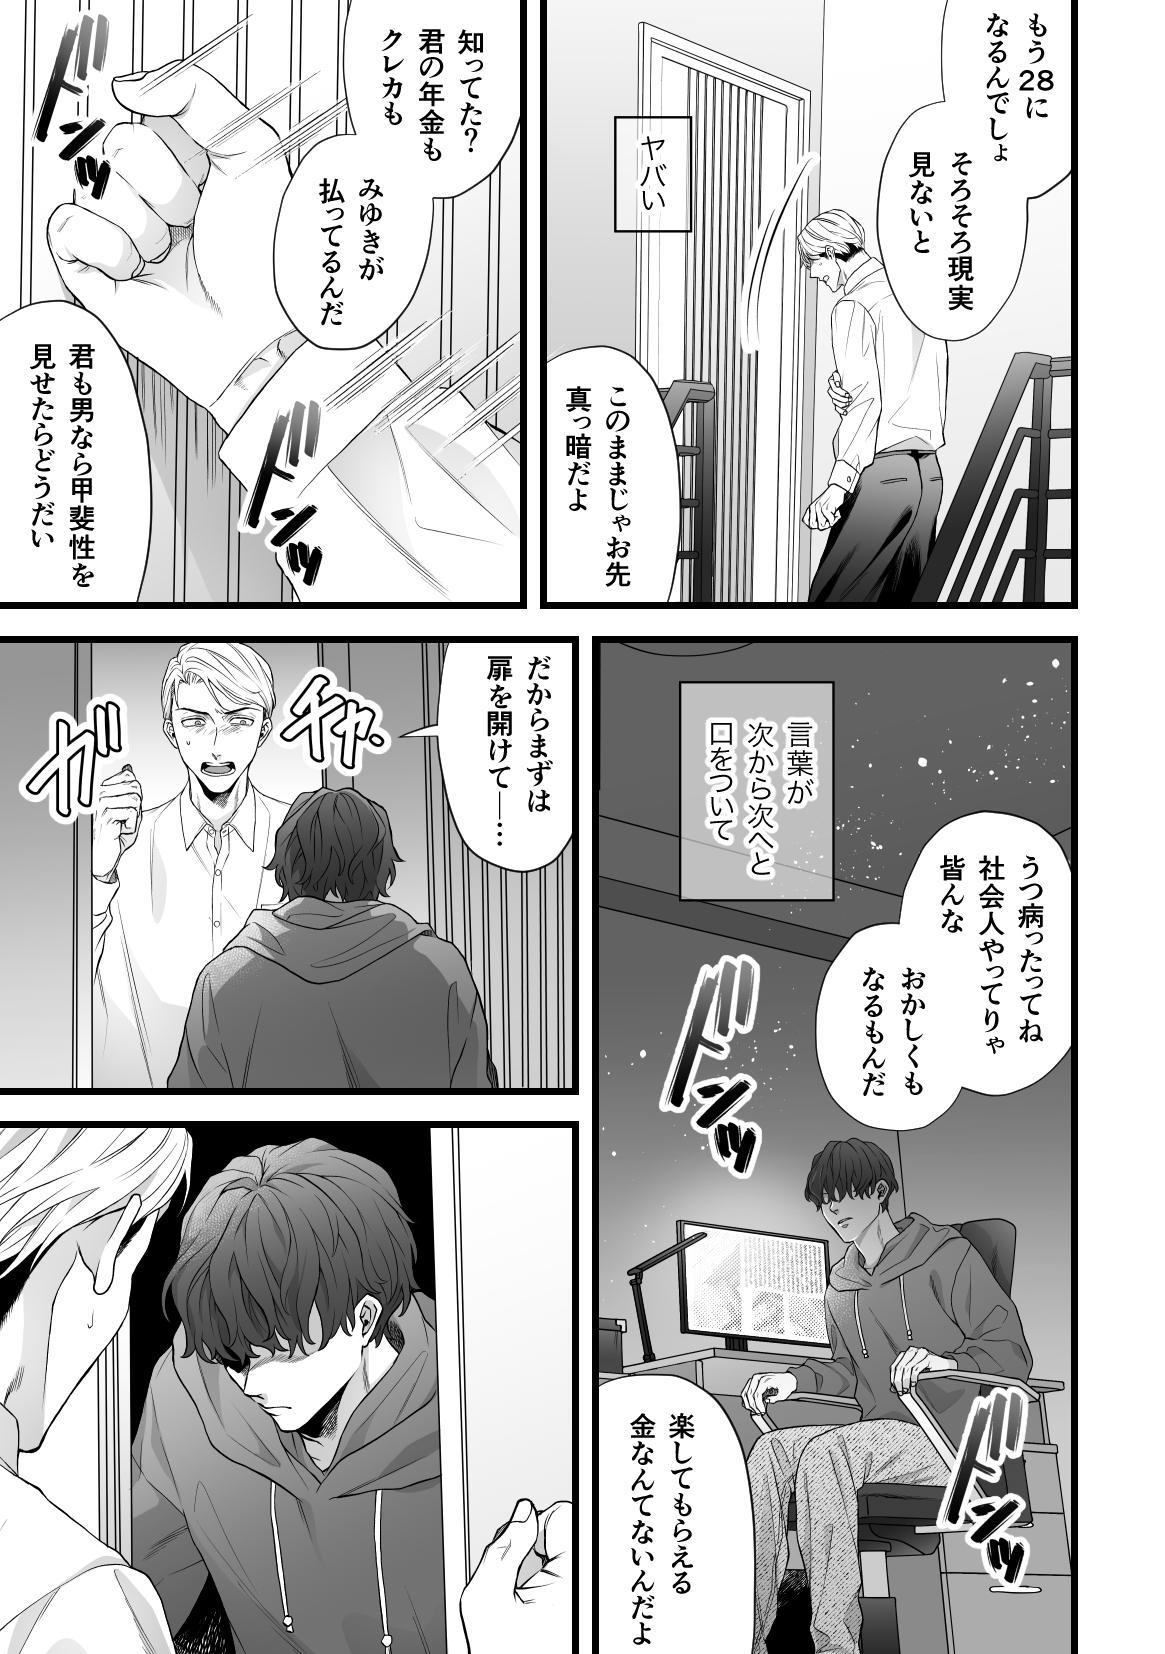 Gikei Ryoujoku 6